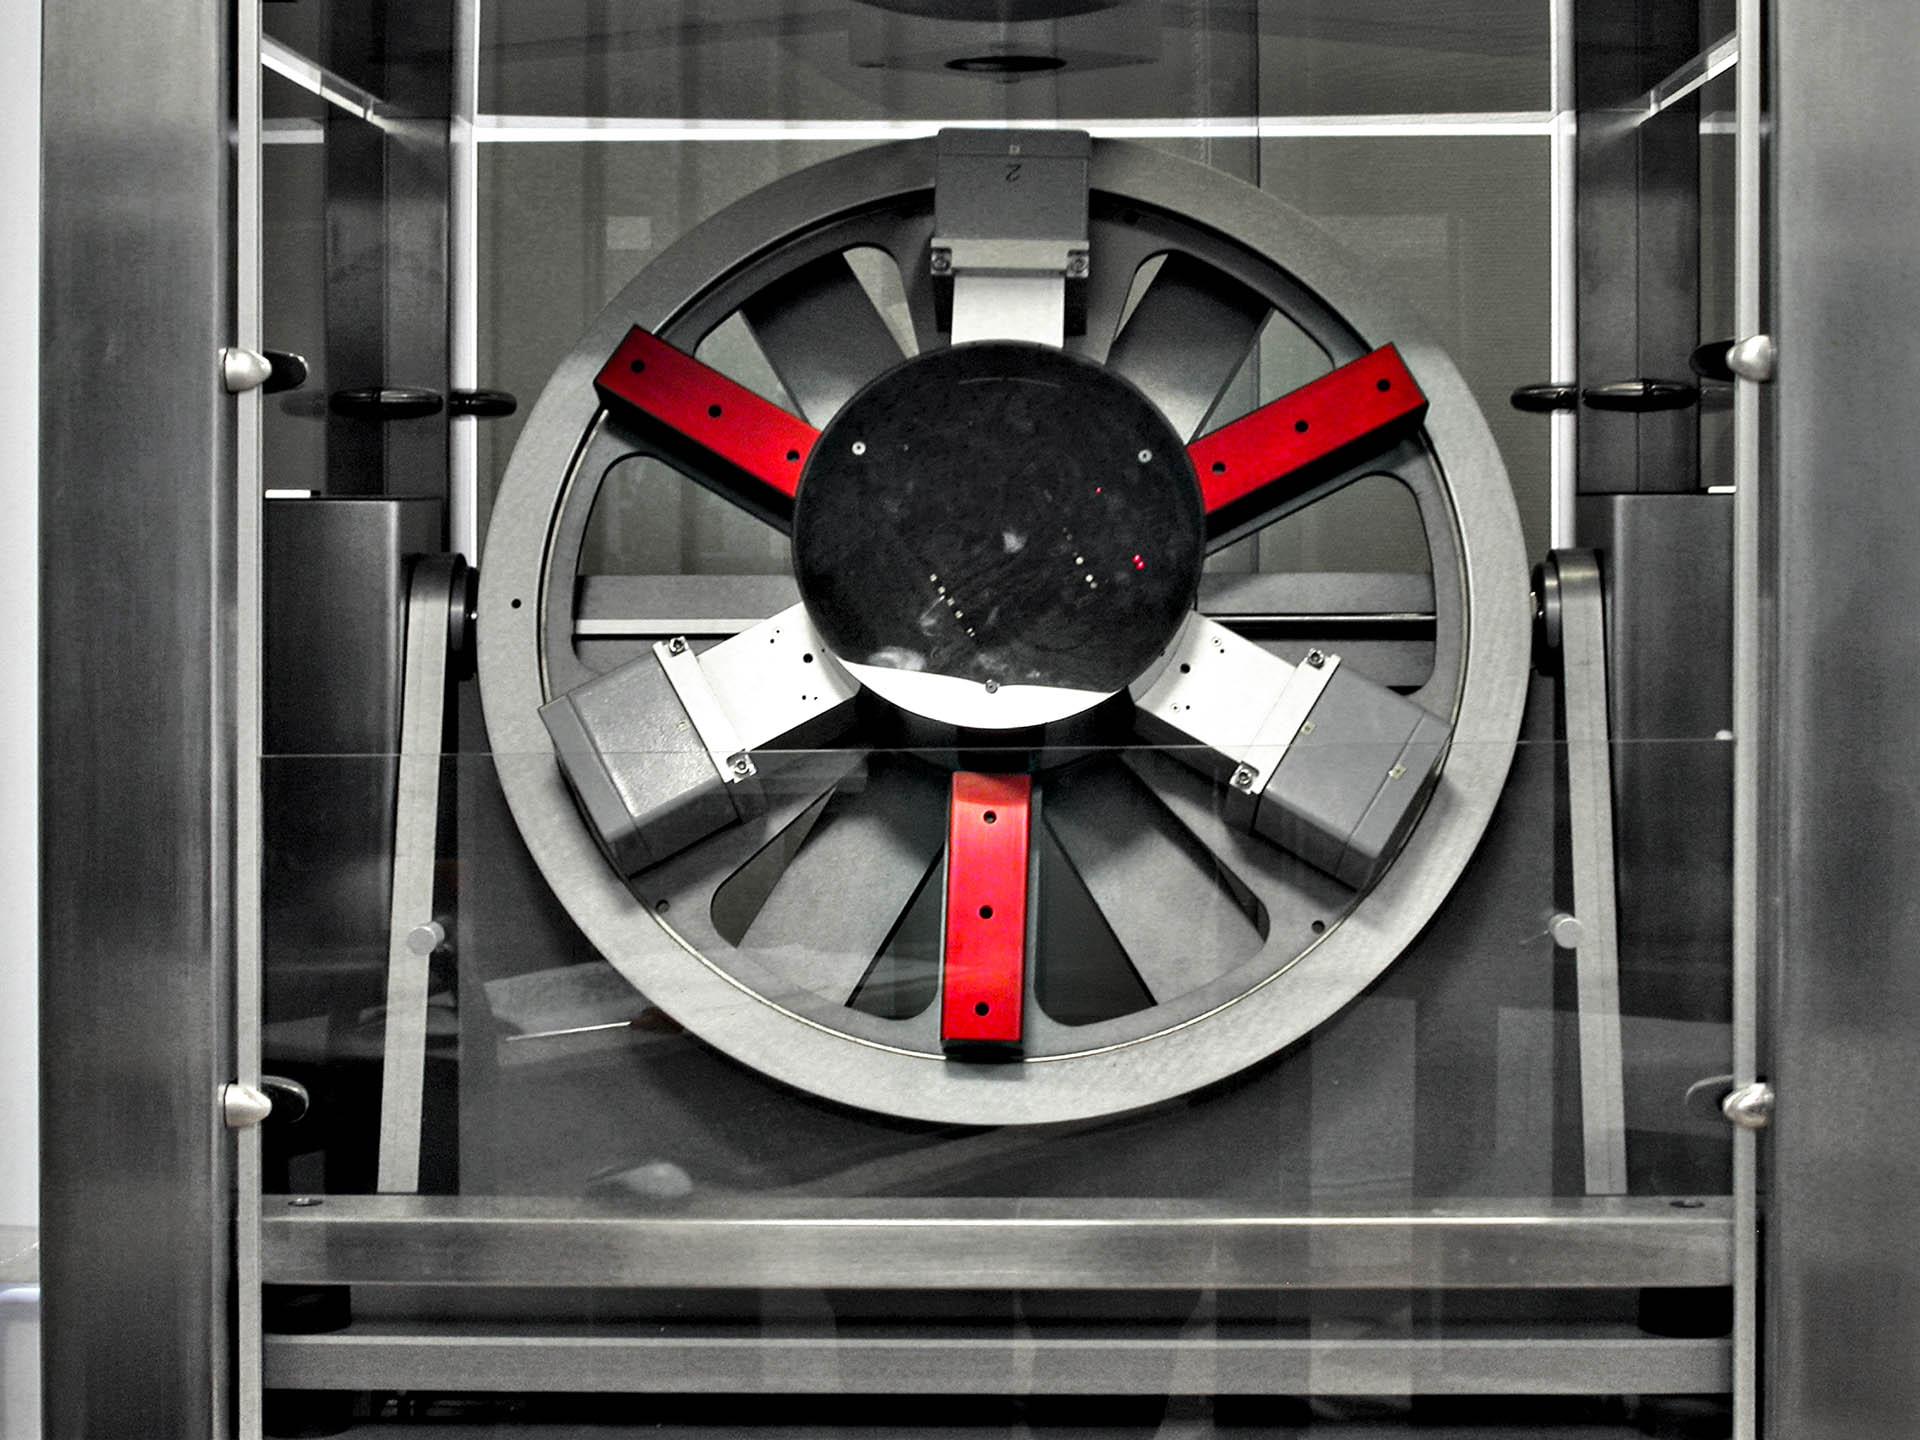 Flouritest Chronometerprüfung